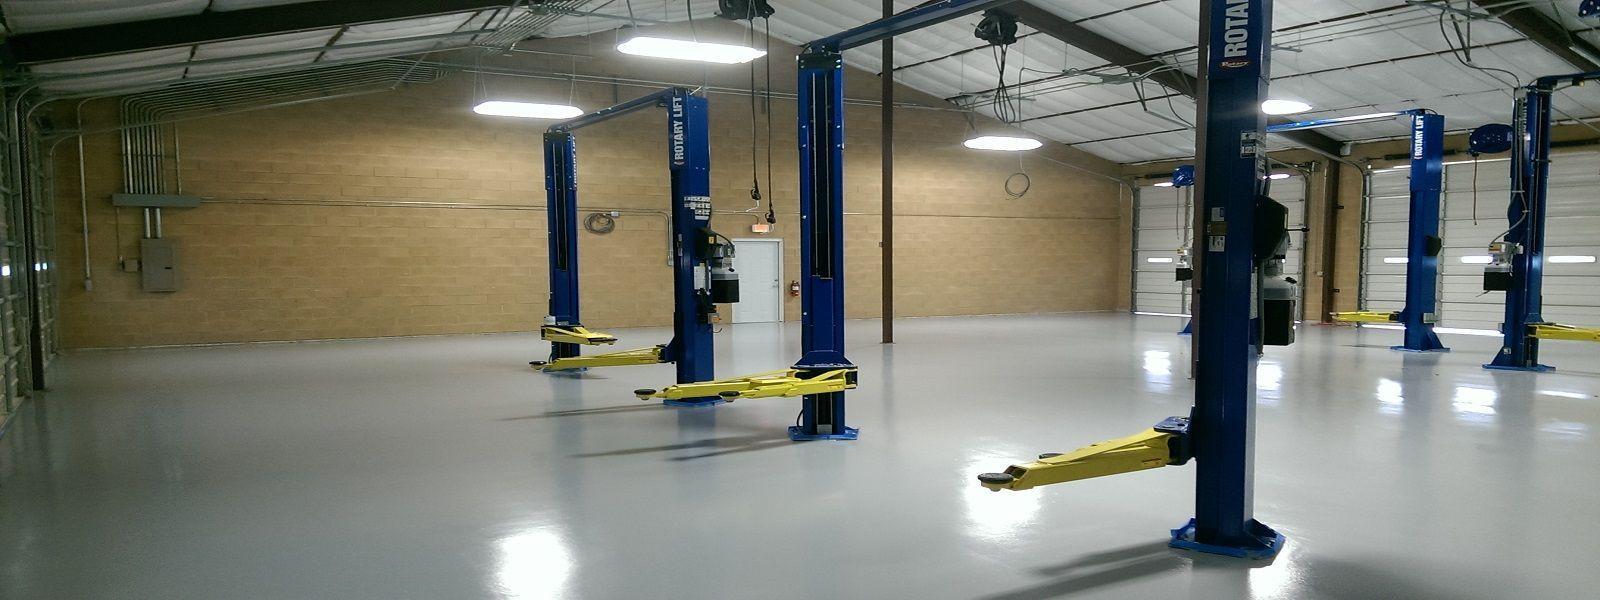 Armorpoxy Epoxy Floor Kits Kommerzielle Epoxy Beschichtungen Armorpoxy Epoxy Epoxybeschichtungen Floor Ki In 2020 Epoxy Floor Garage Floor Coatings Epoxy Coating